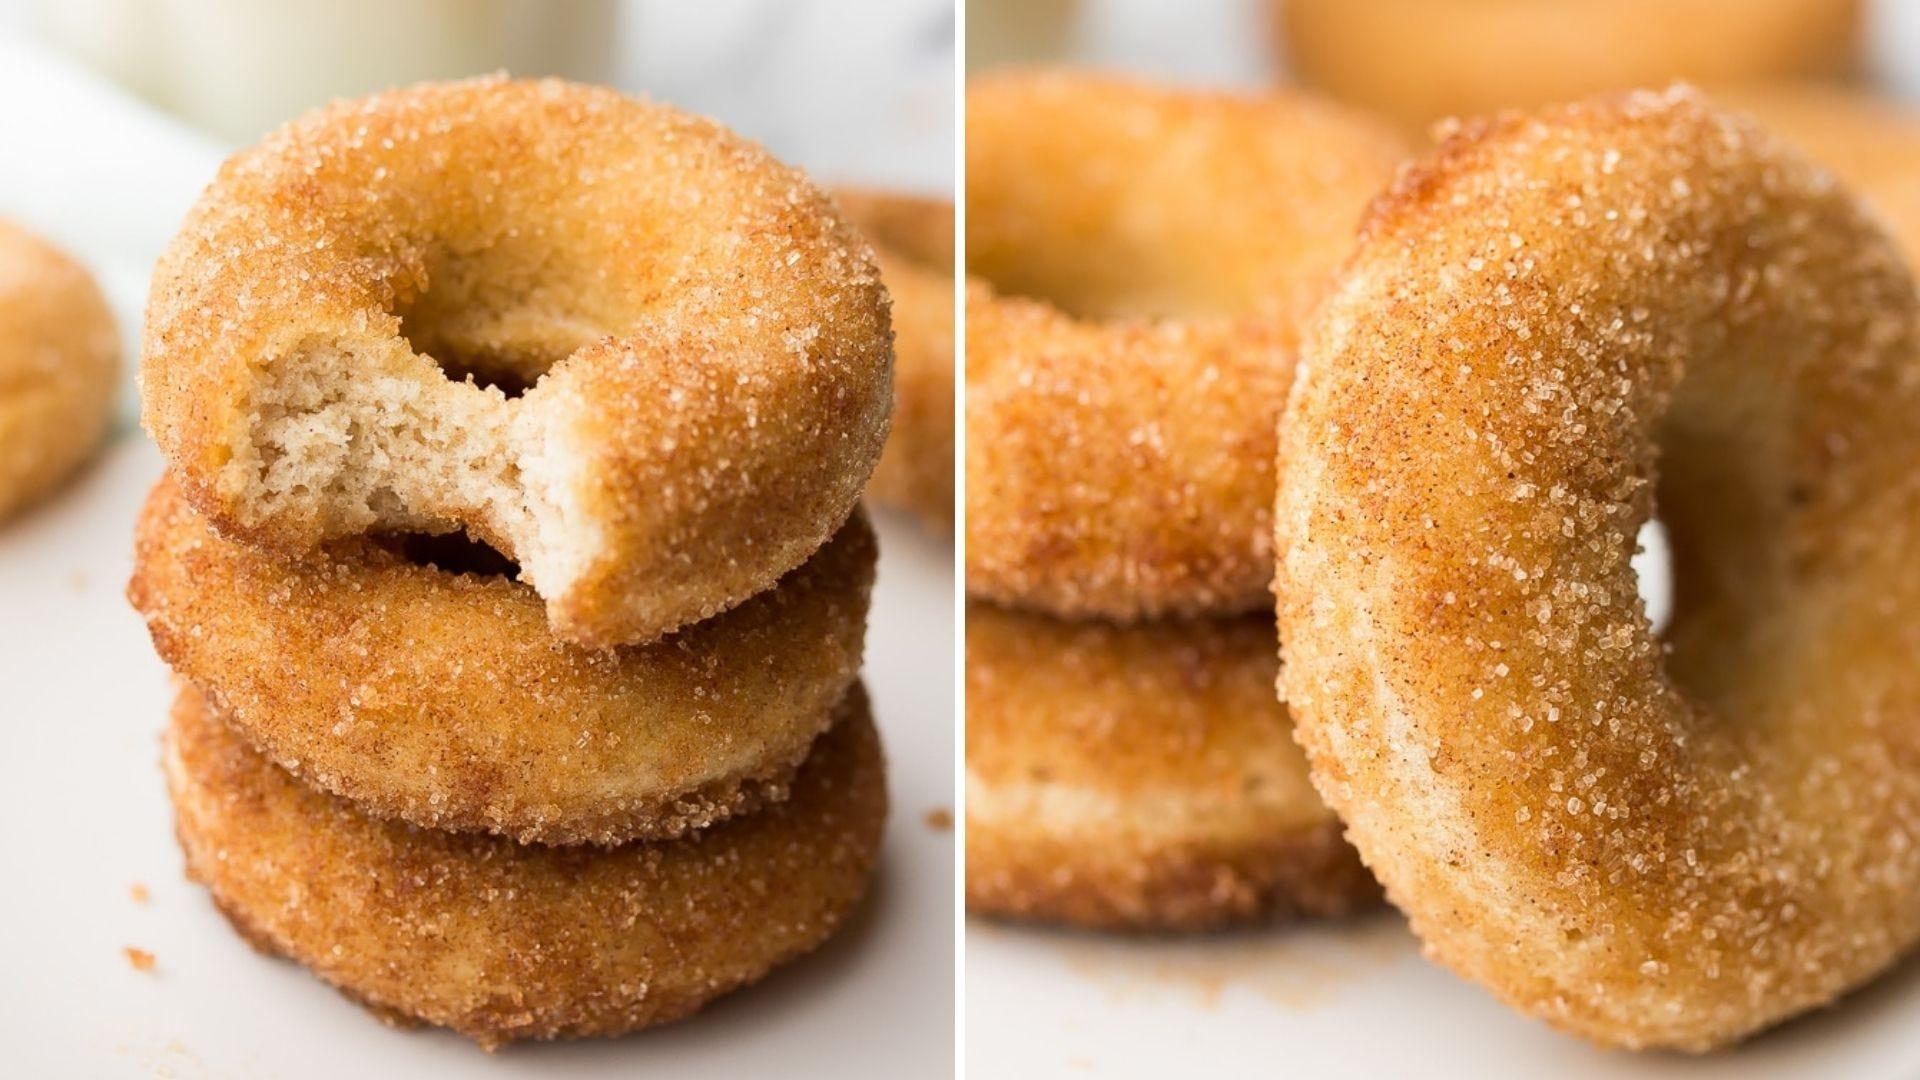 Two piles of cinnamon sugar doughnuts